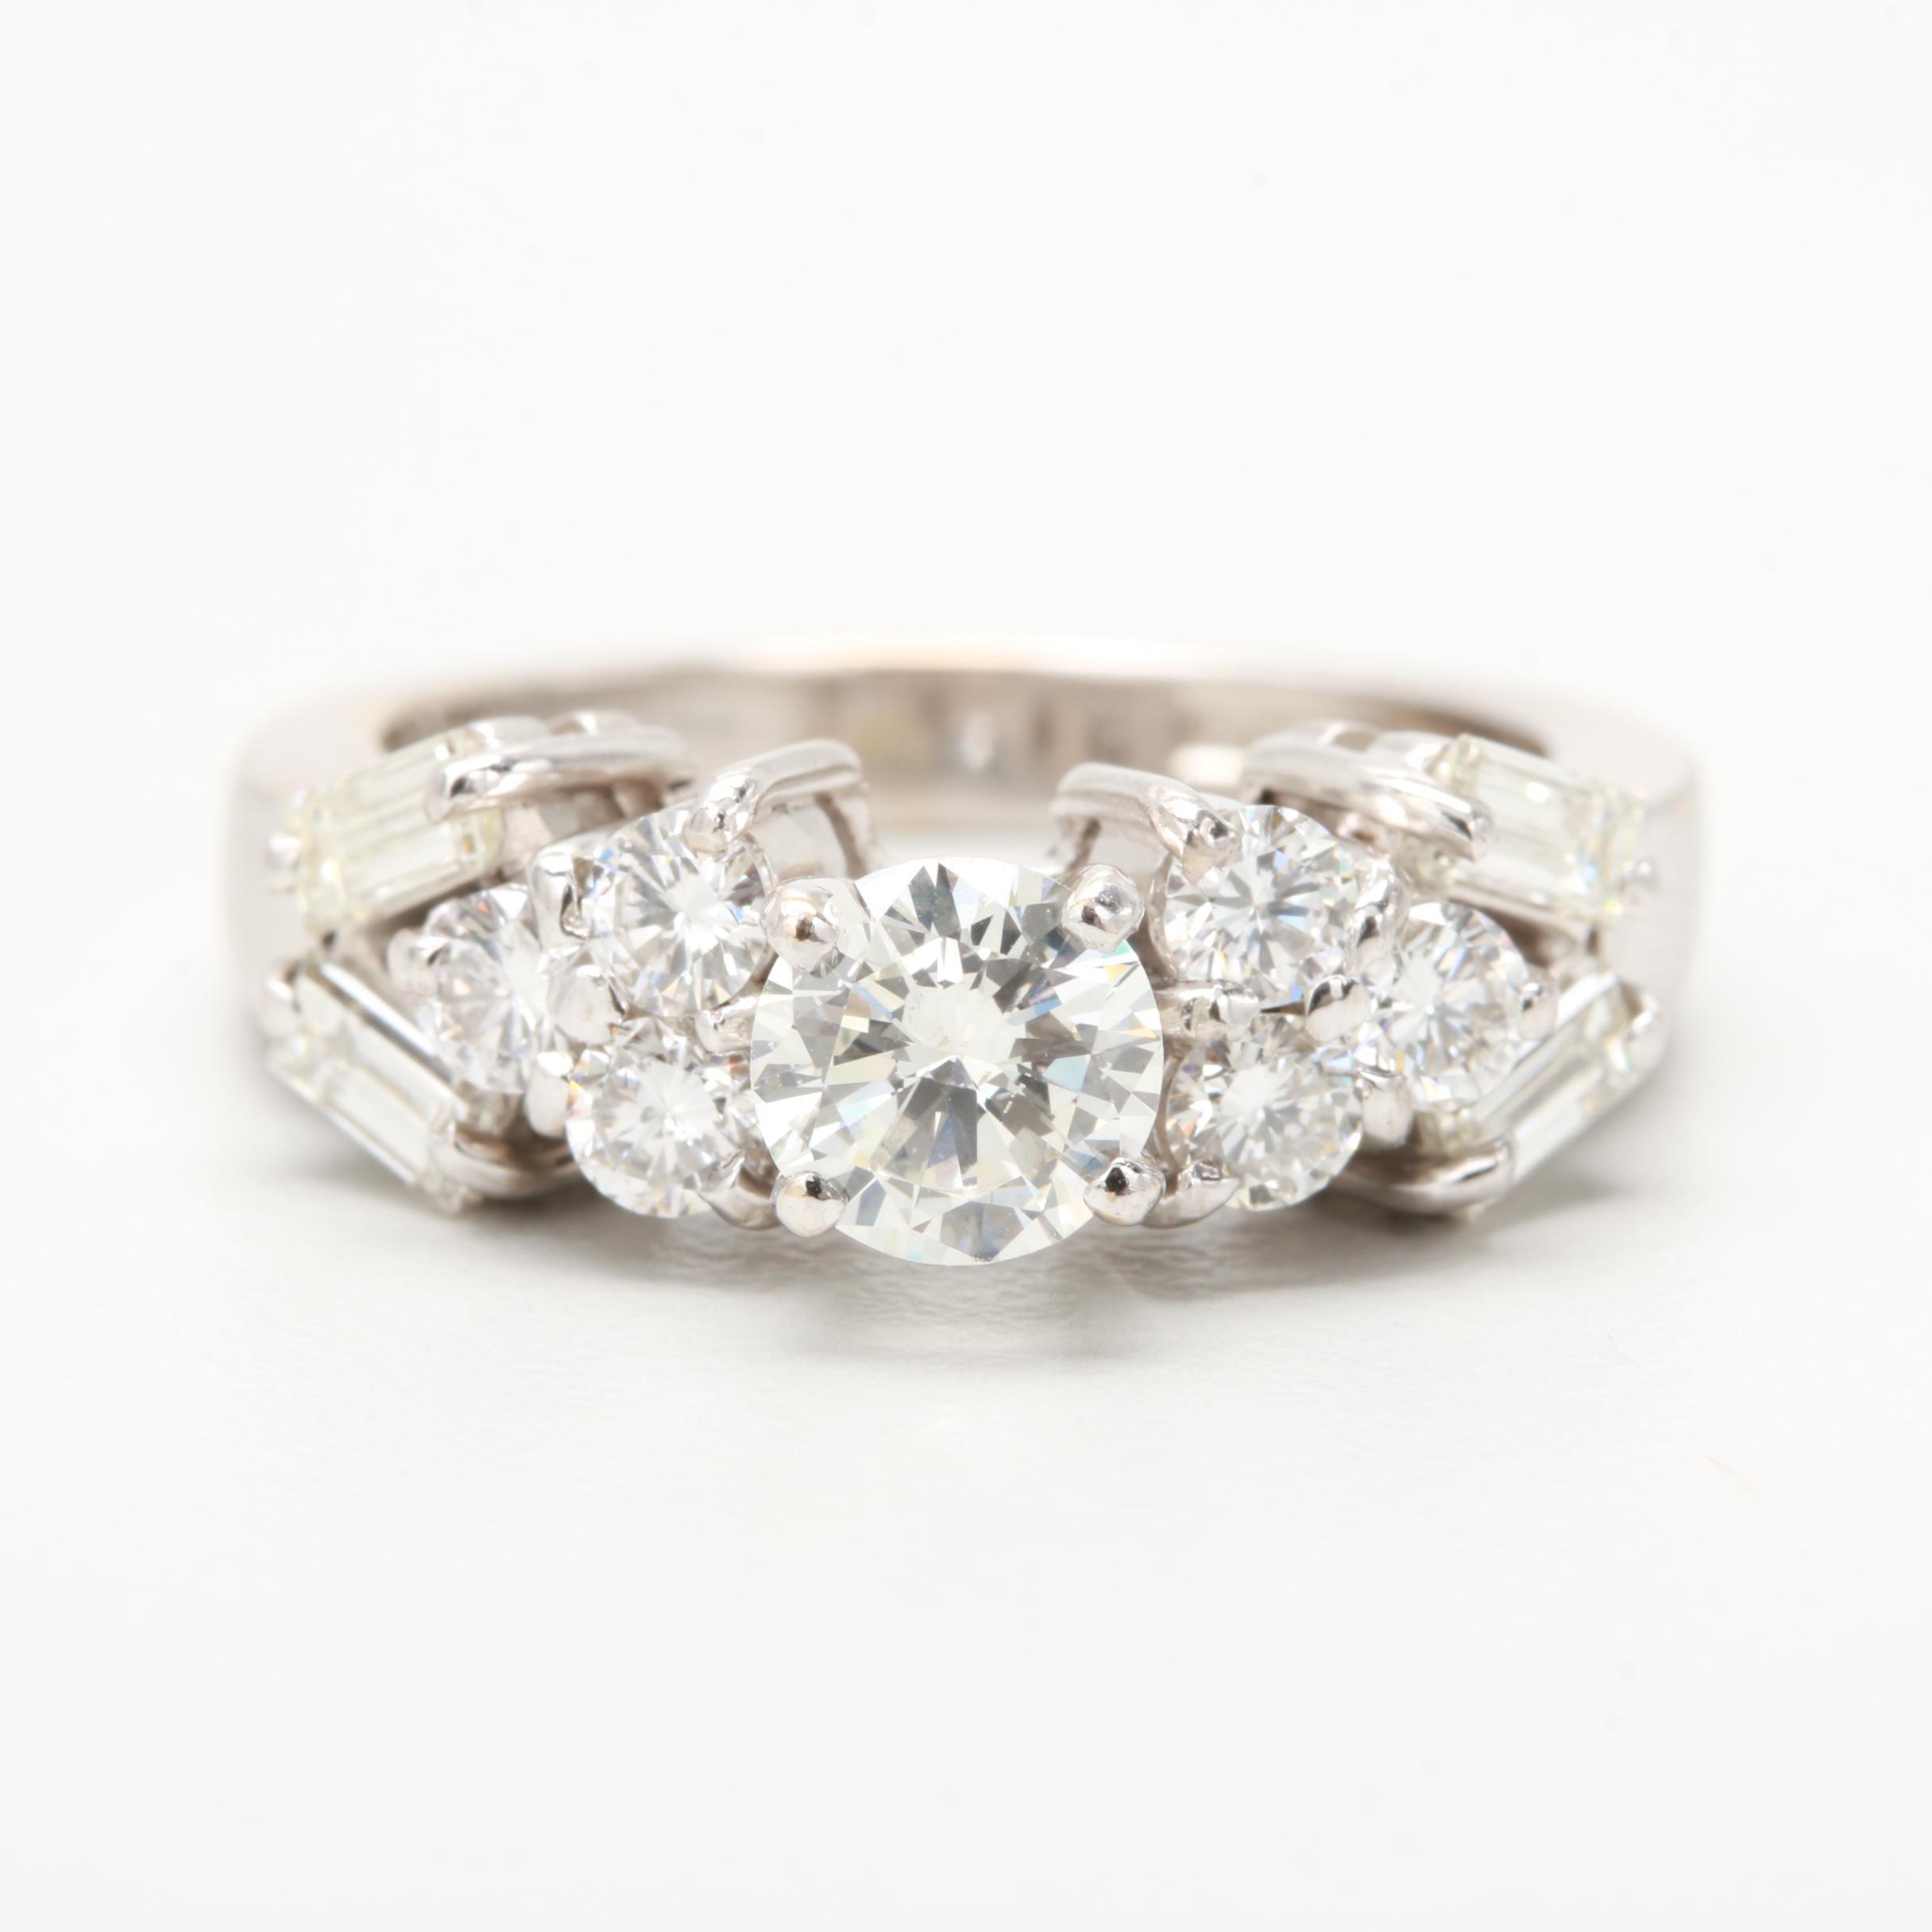 Egyptian 18K White Gold 1.52 CTW Diamond Ring